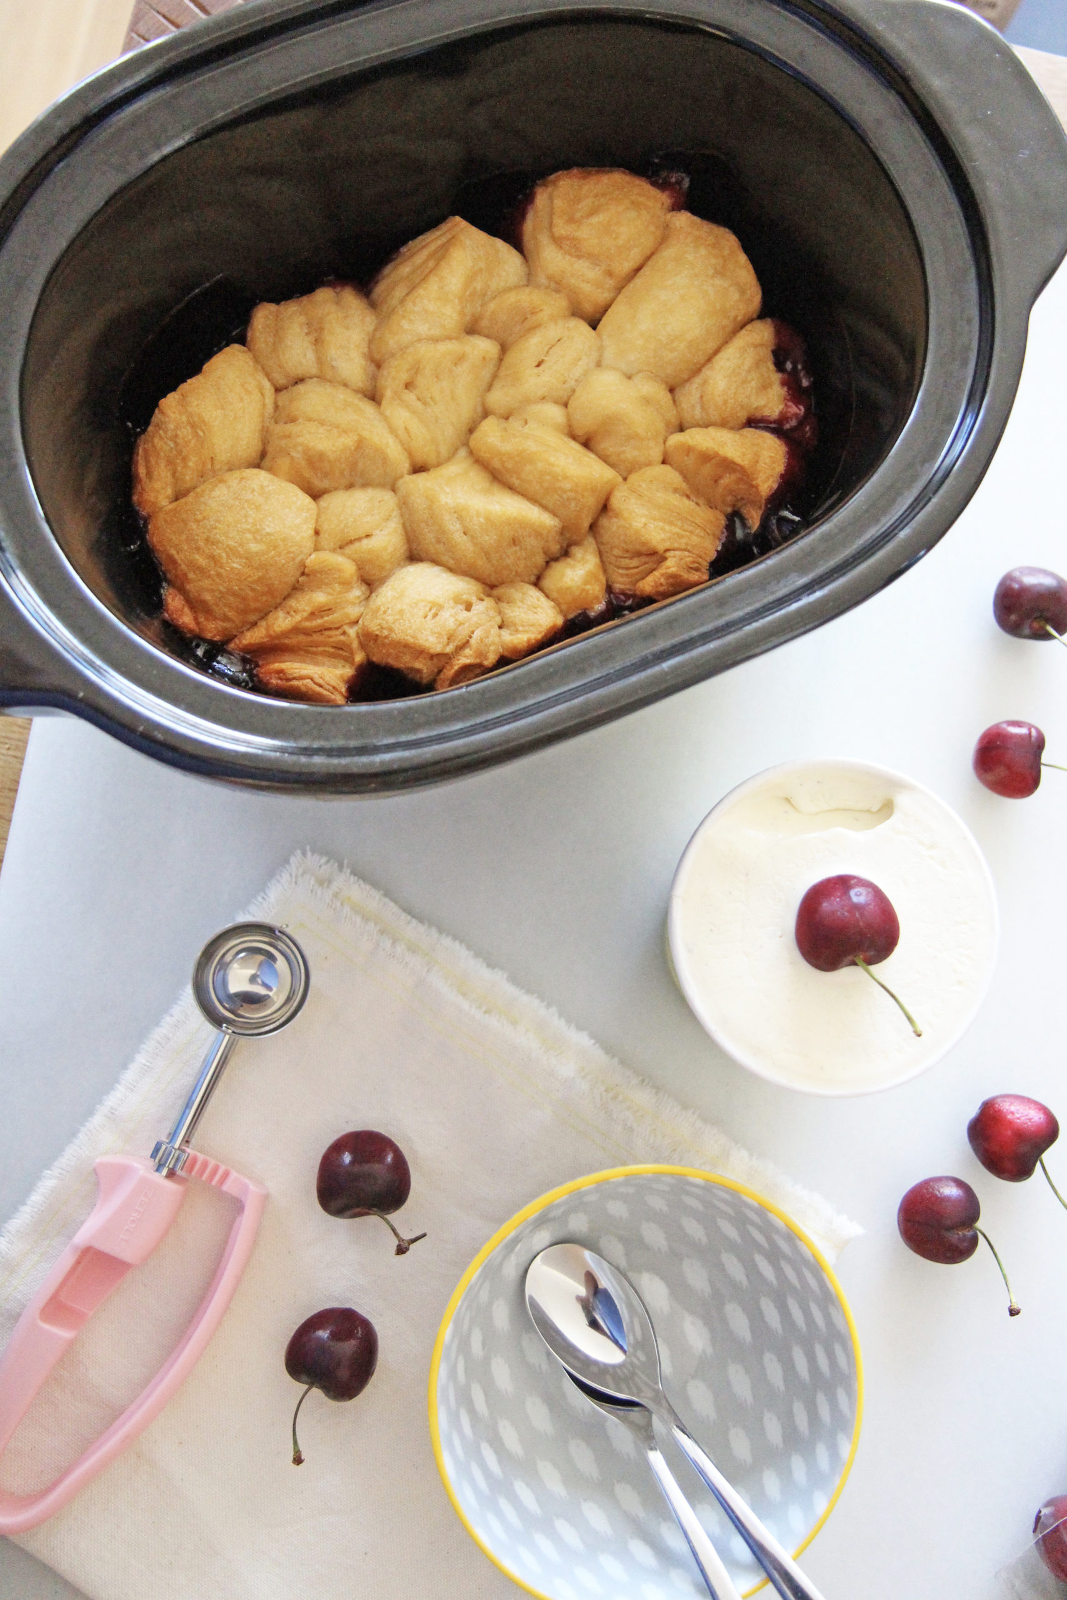 Slow Cooker Biscuit Cherry Pie Recipe. Easy dessert for non bakers. www.ChopHappy.com #cherrypie #slowcookerdessert